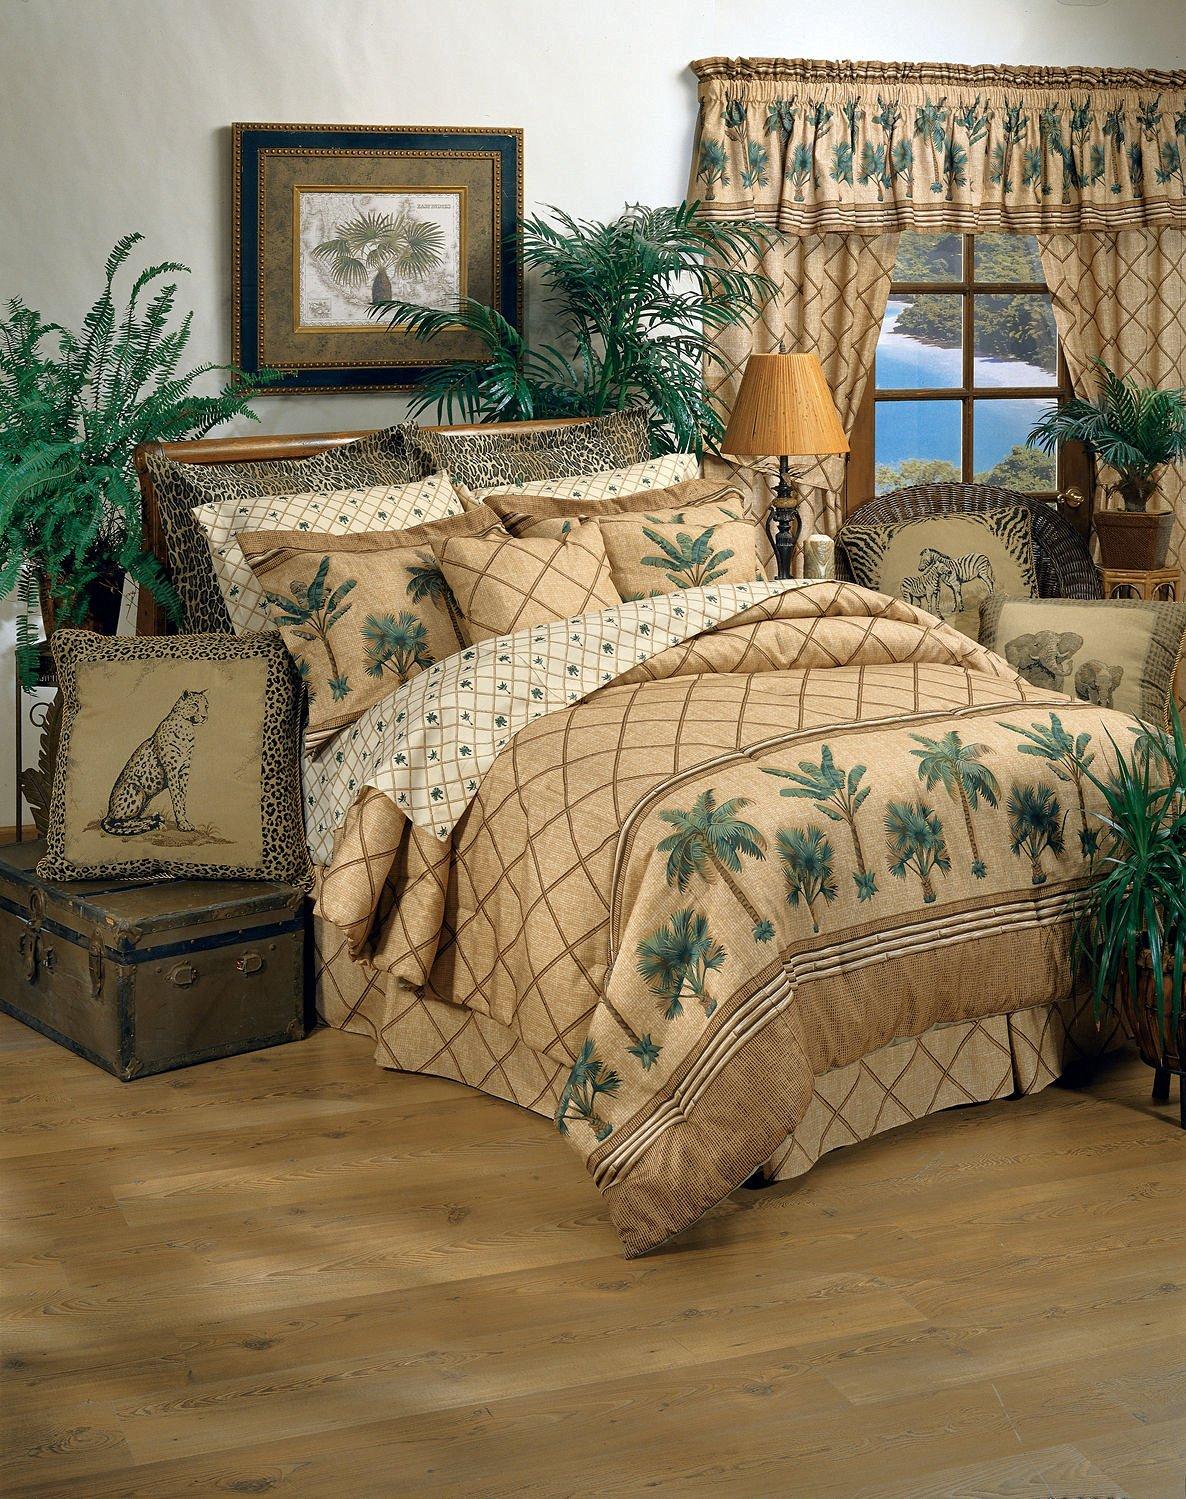 Get Quotations Kona Tropical Bedding 8 Pc Queen Comforter Set 1 Flat Sheet